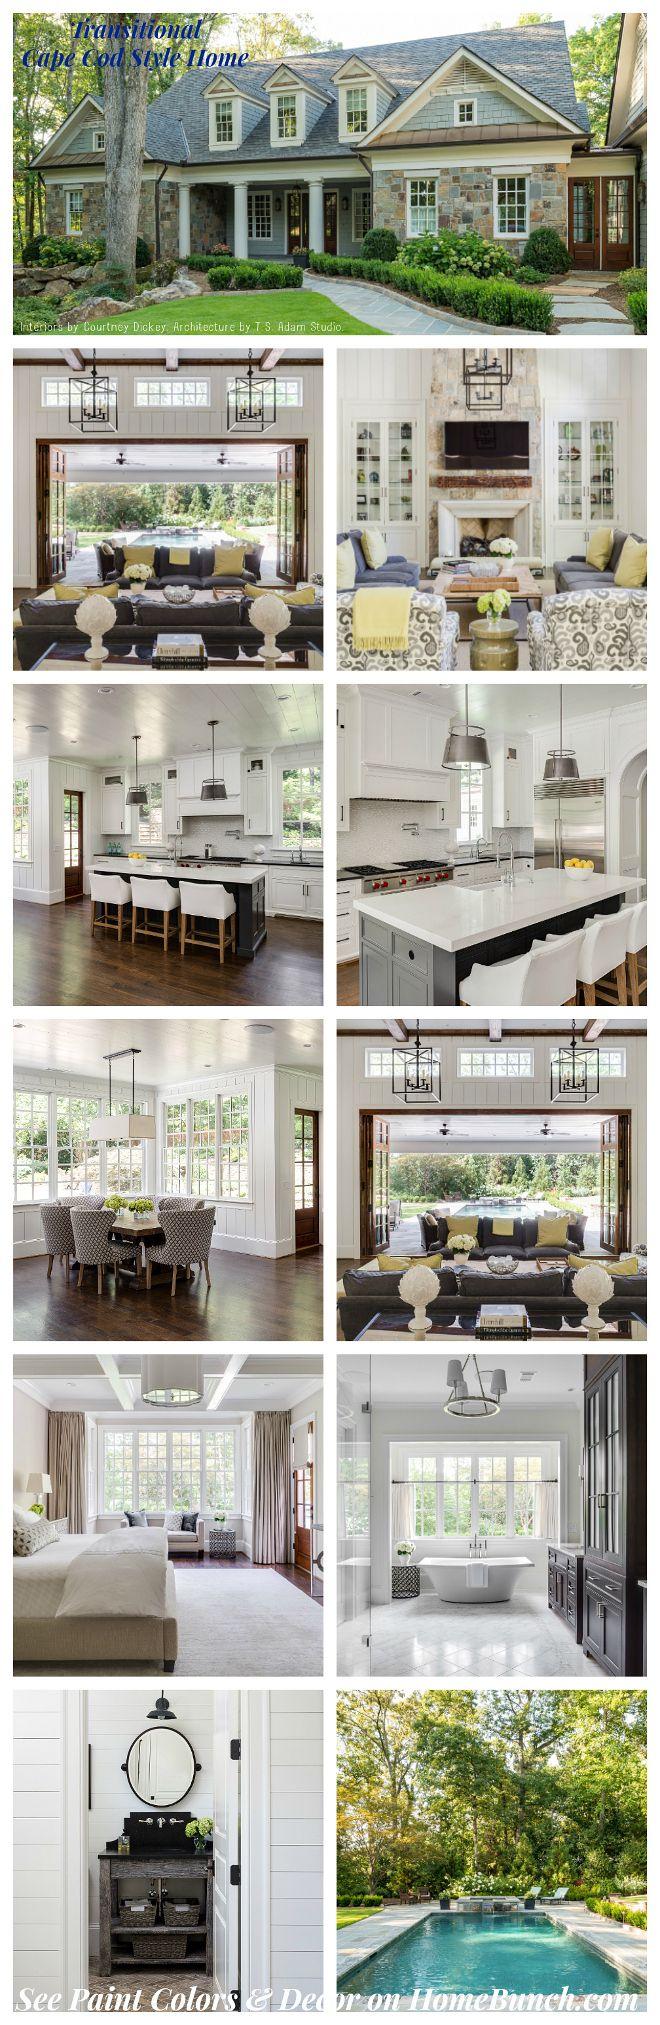 Cape Cod Decorating Ideas Part - 41: Cape Cod House Style Ideas And Floor Plans ( Interior U0026 Exterior )